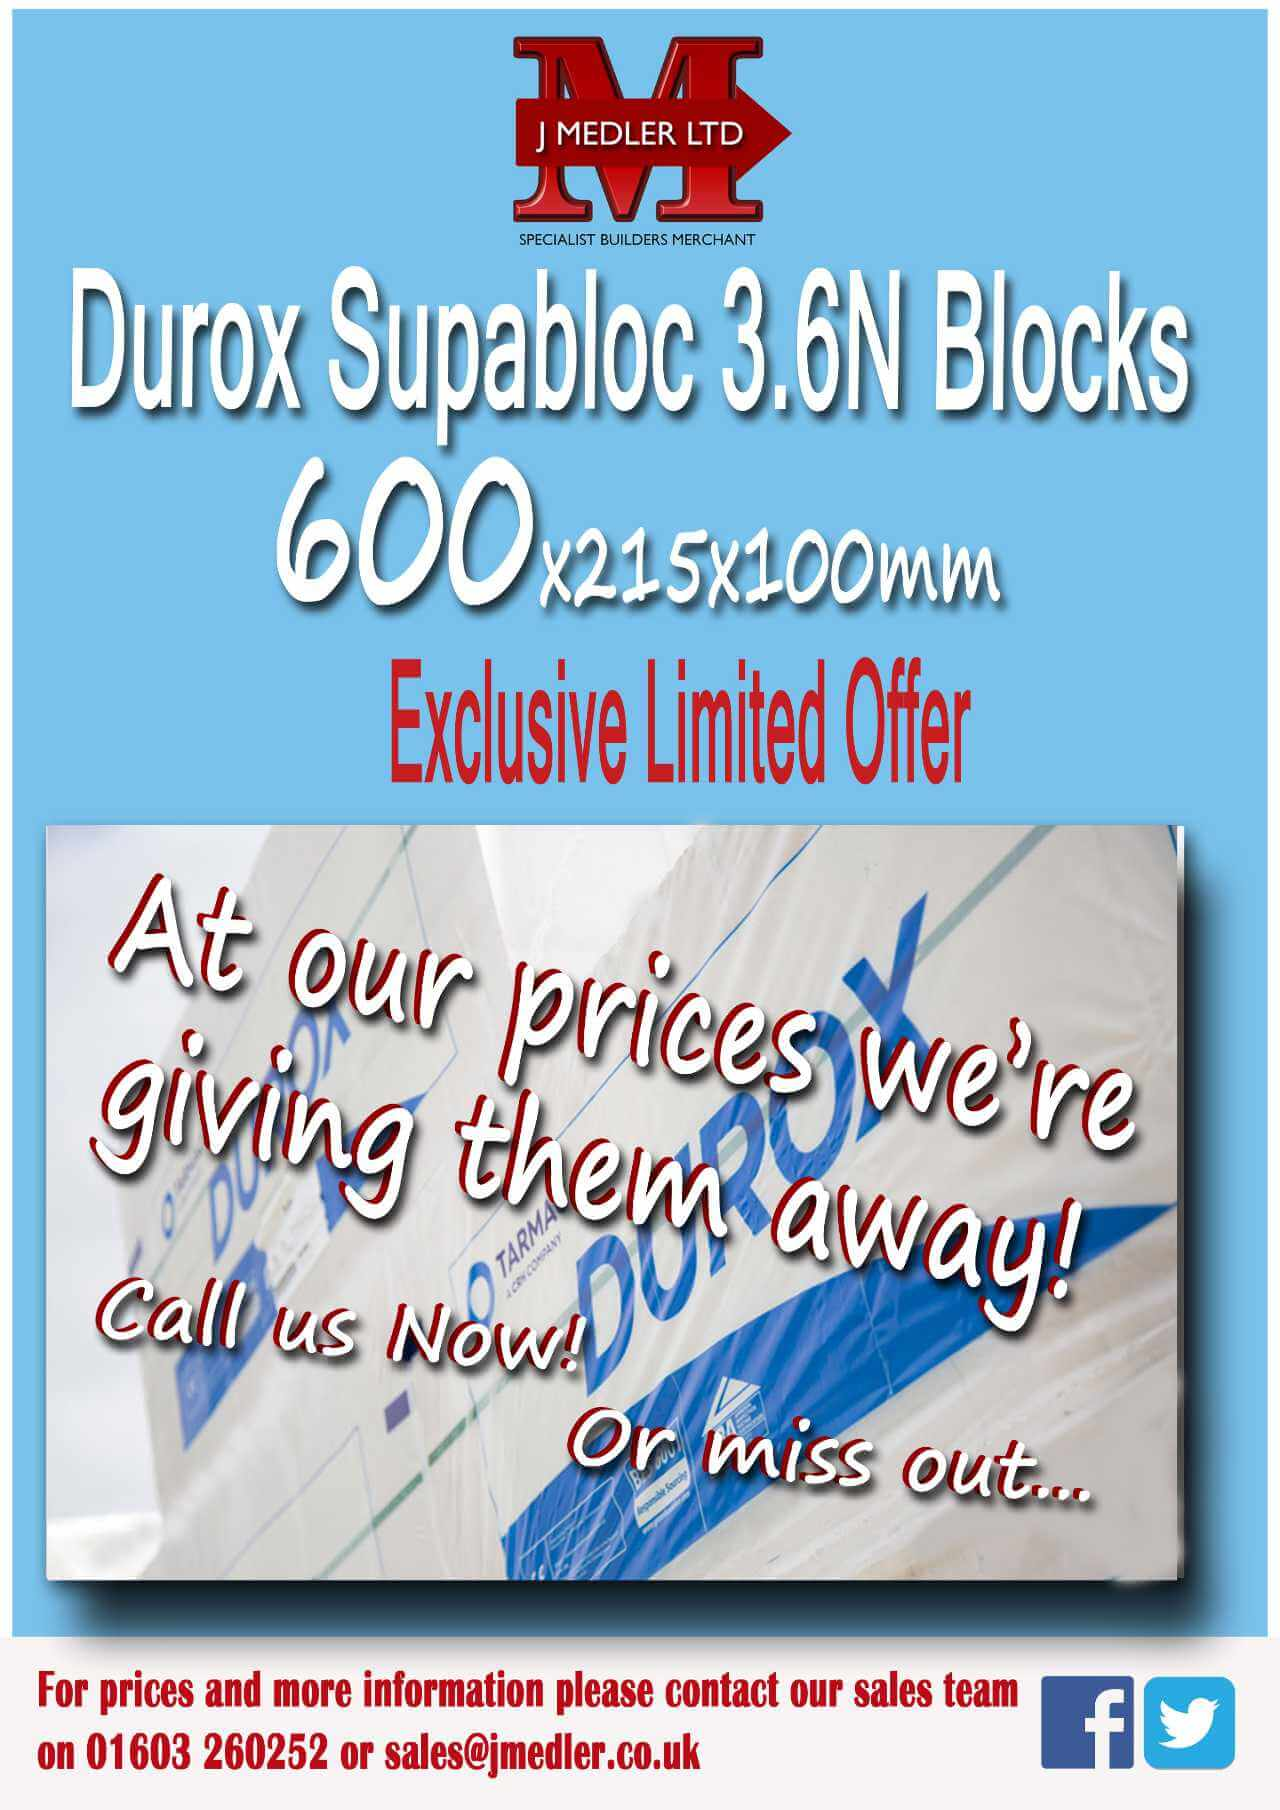 Durox block offer